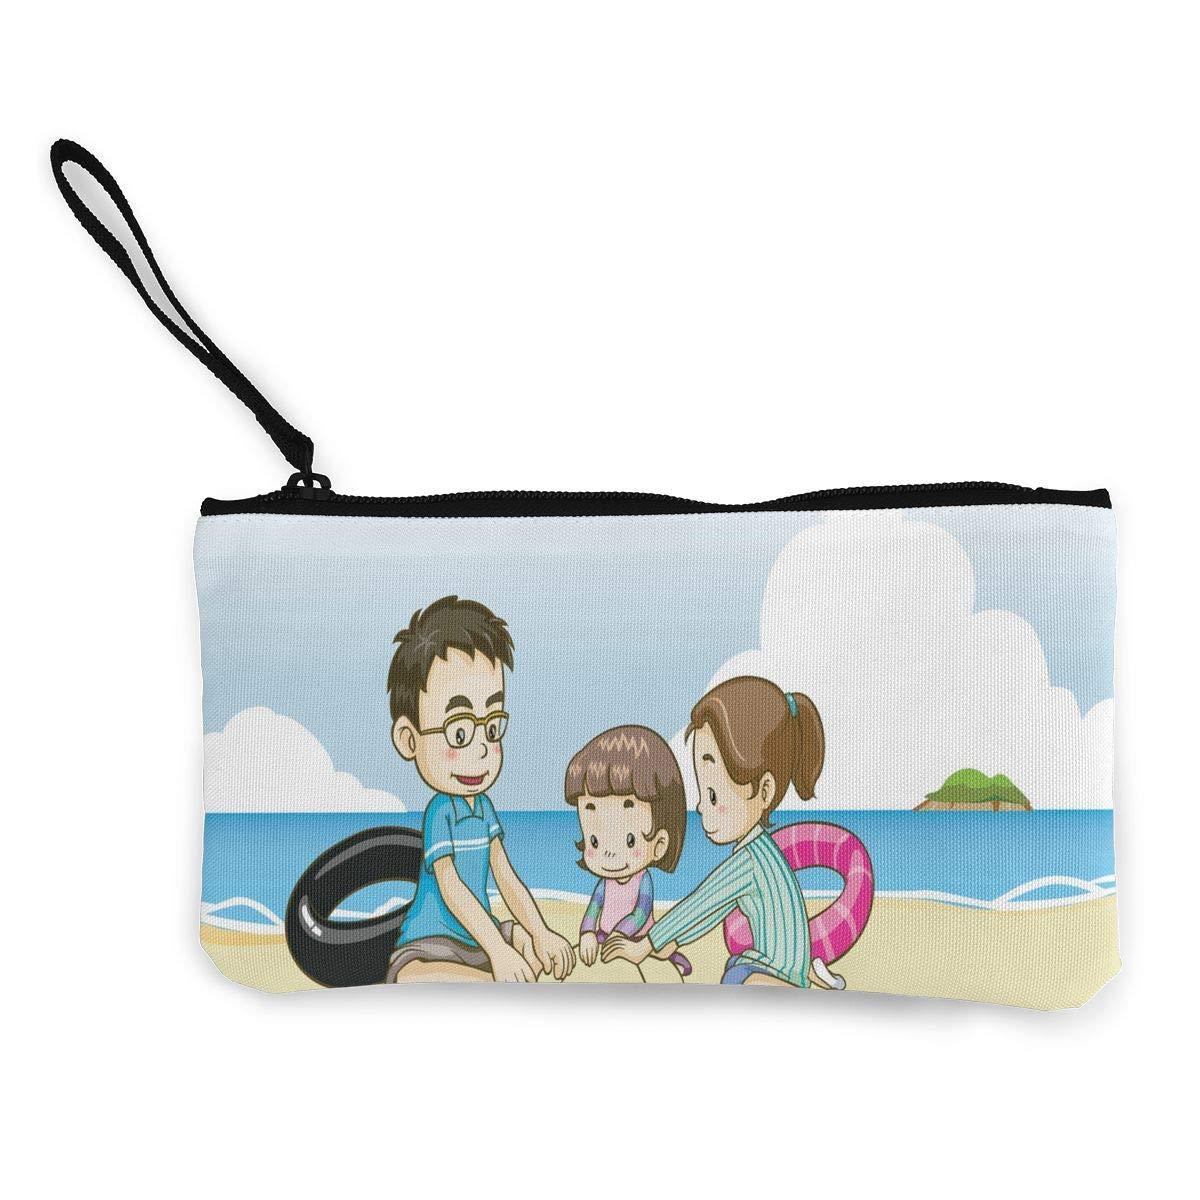 Coin Purse Kids Playing with Sand at Beach Men Zip Canvas Wallet ChangeInspiring Case